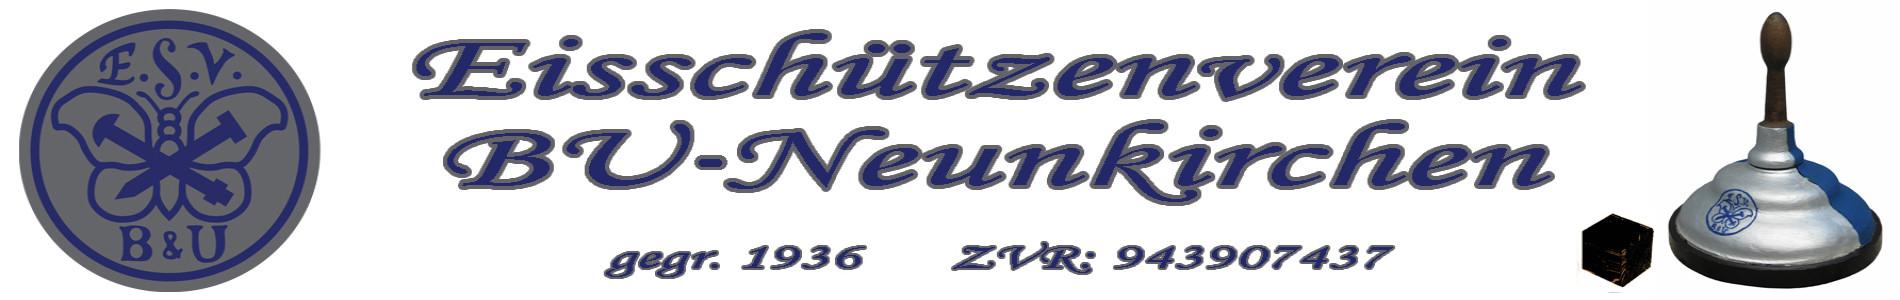 ESV BU-Neunkirchen